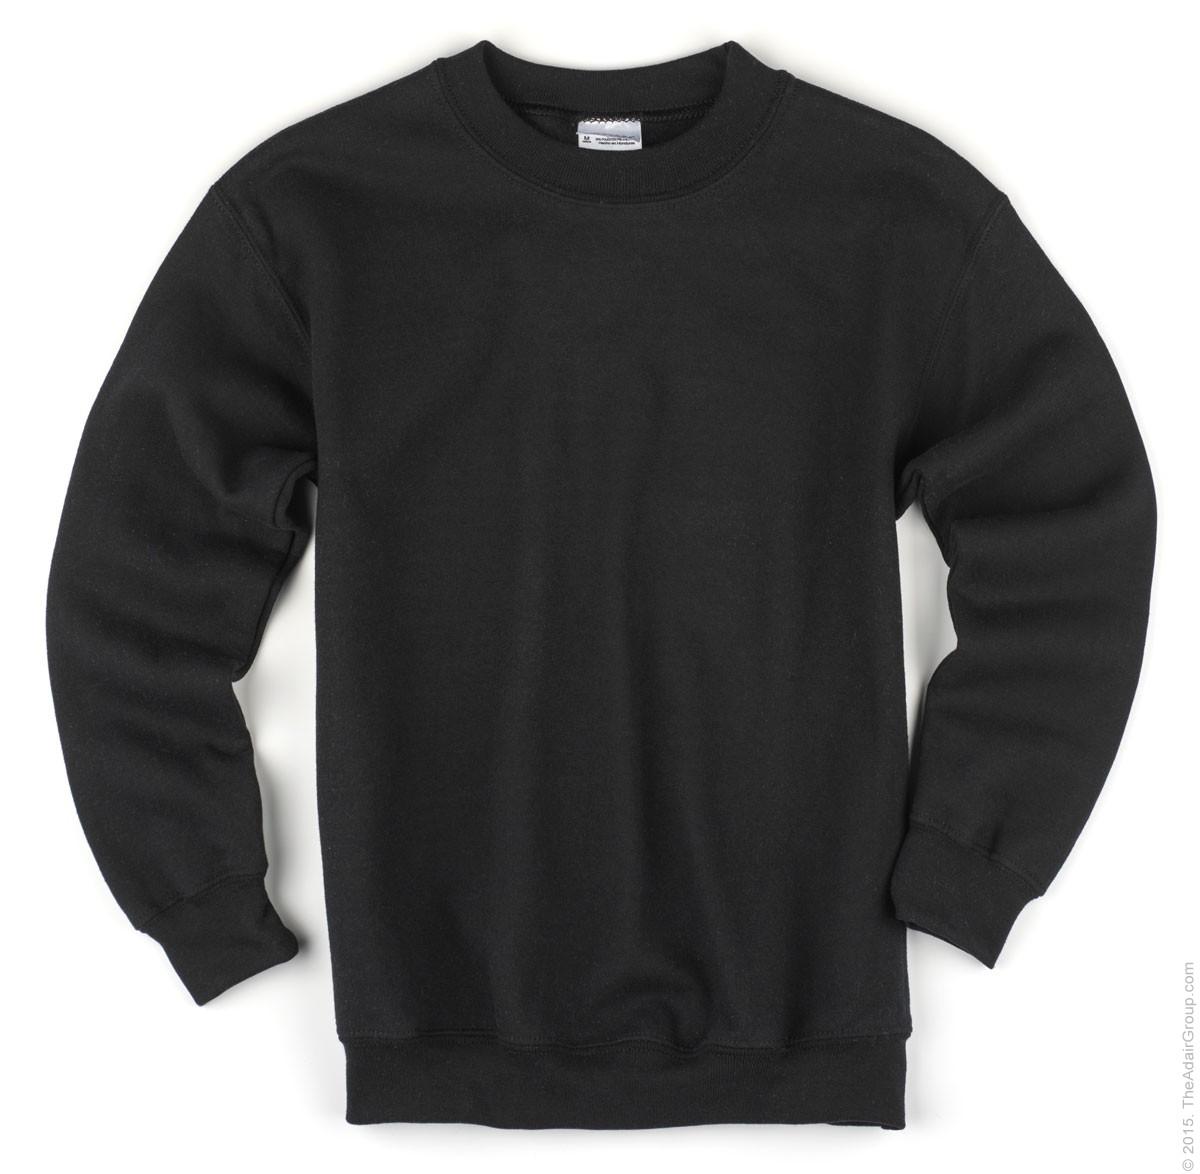 Shop Crewneck Sweatshirts at Wholesale Prices from Adair